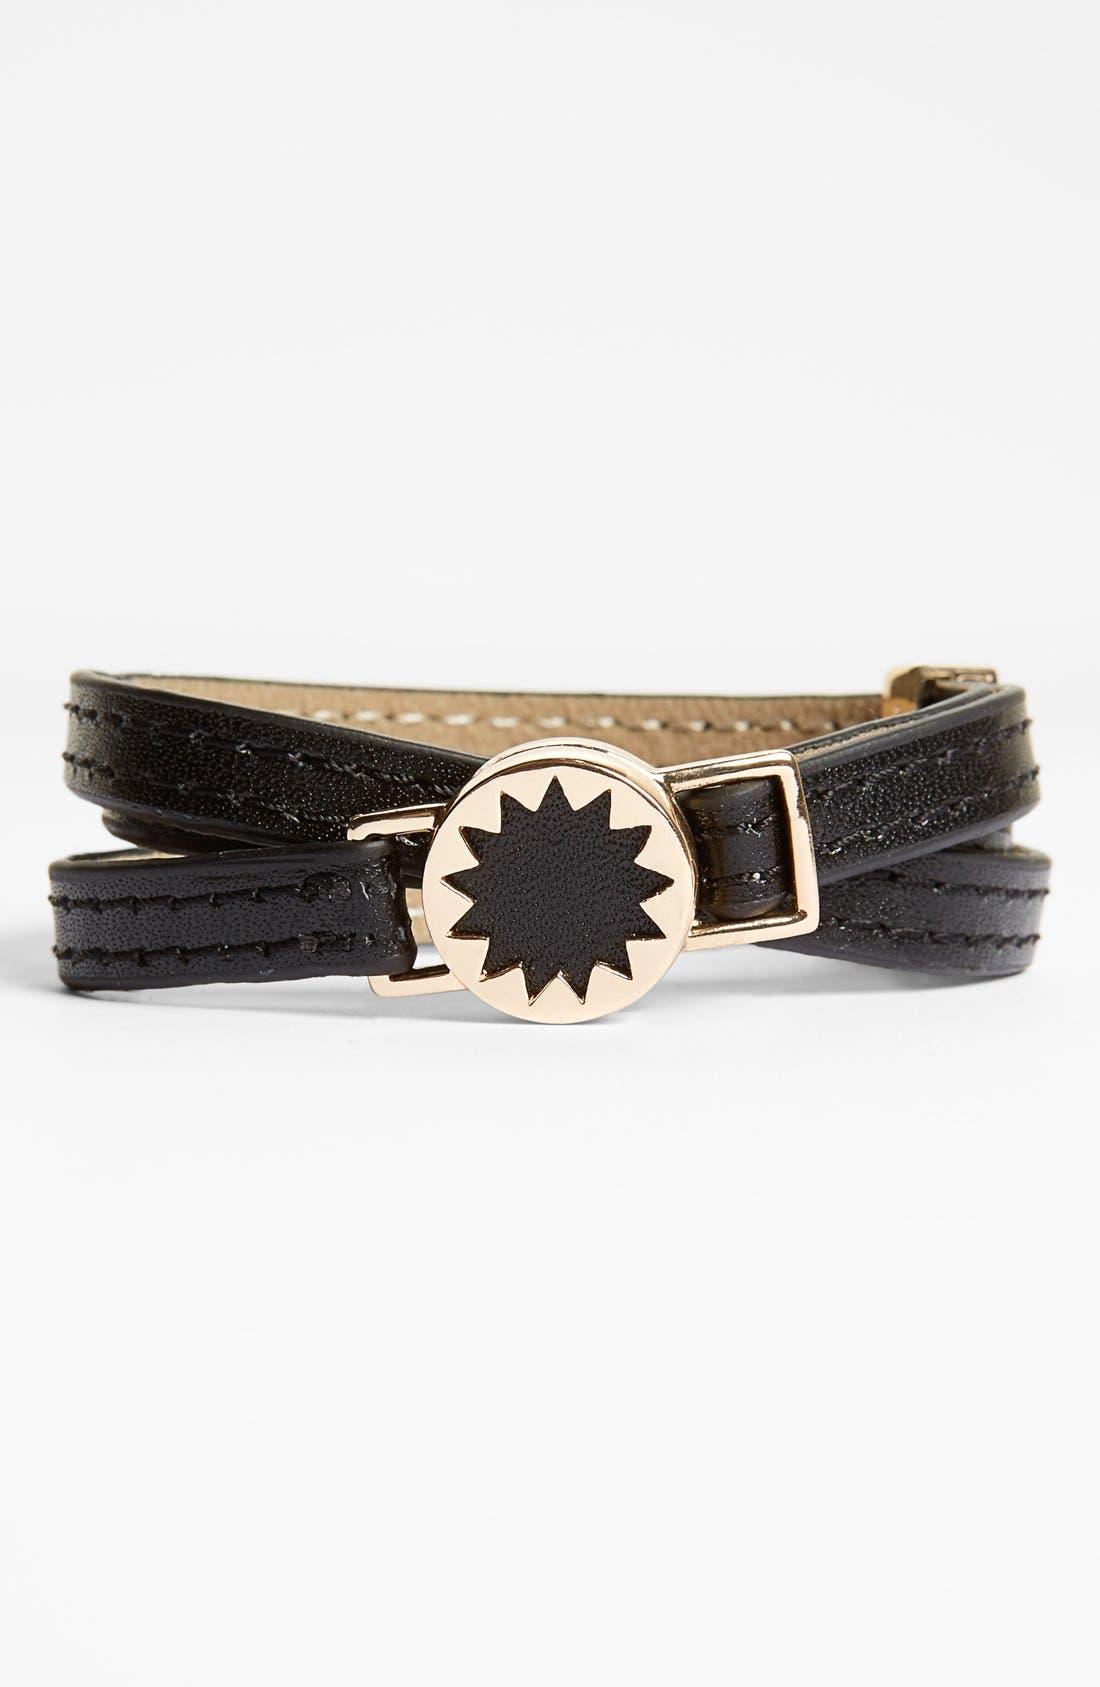 HOUSE OF HARLOW 1960 Sunburst Leather Wrap Bracelet, Main, color, 001